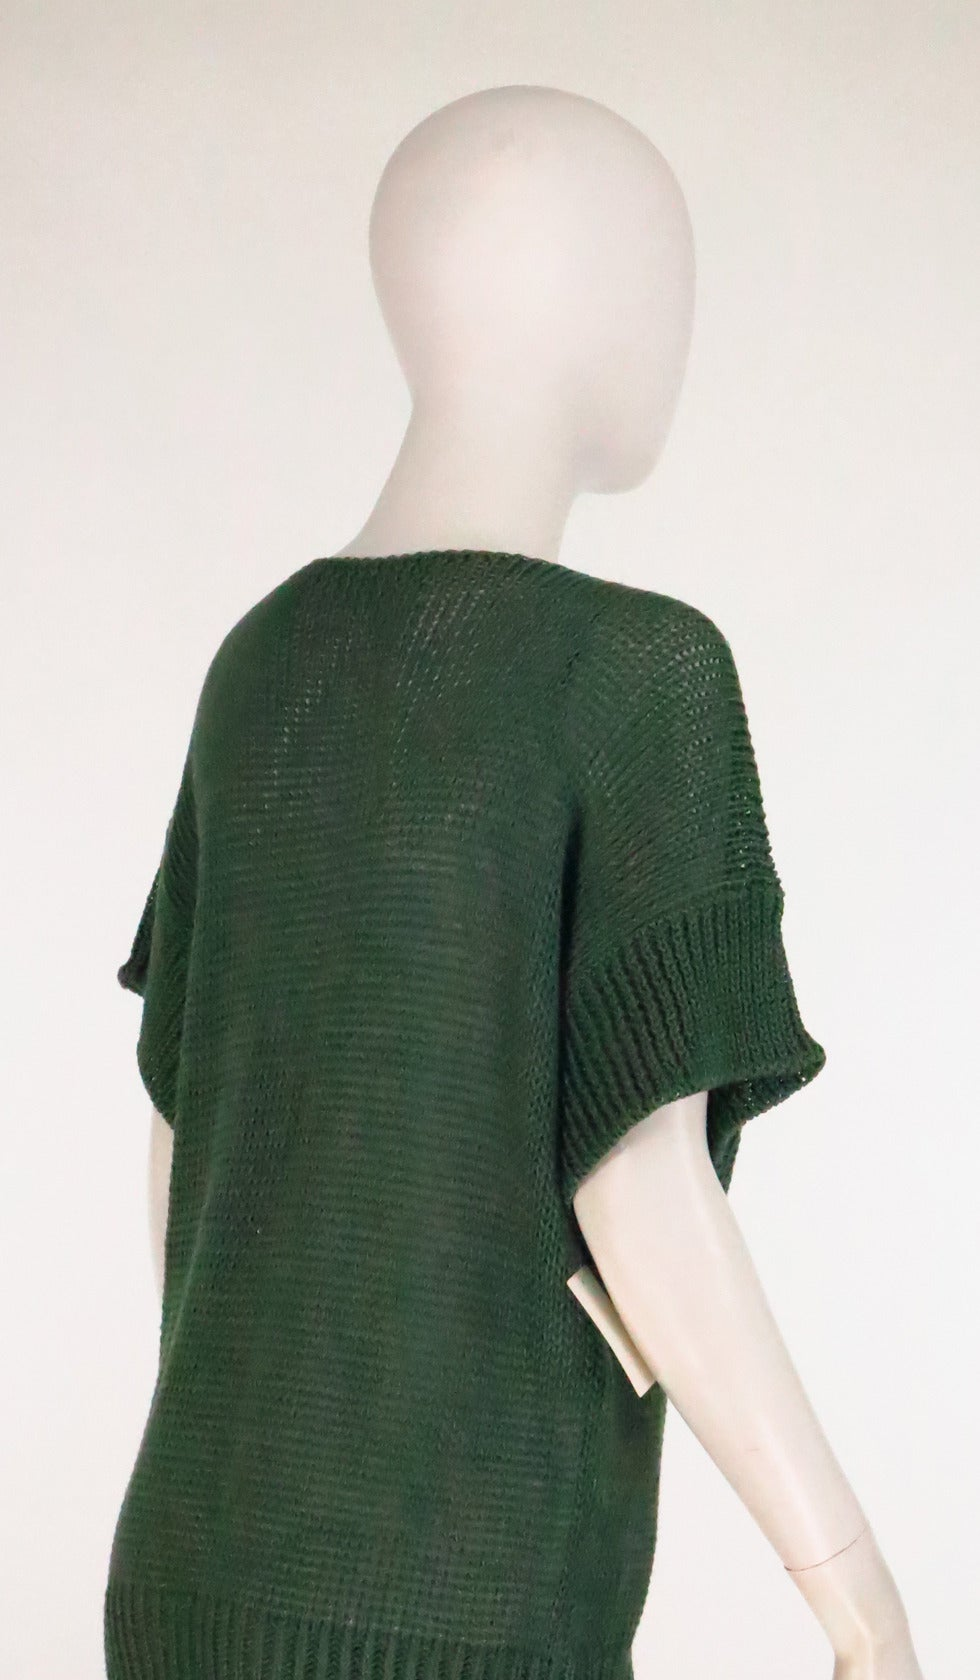 1980s Jil Sander pine green sweater knit tunic 5